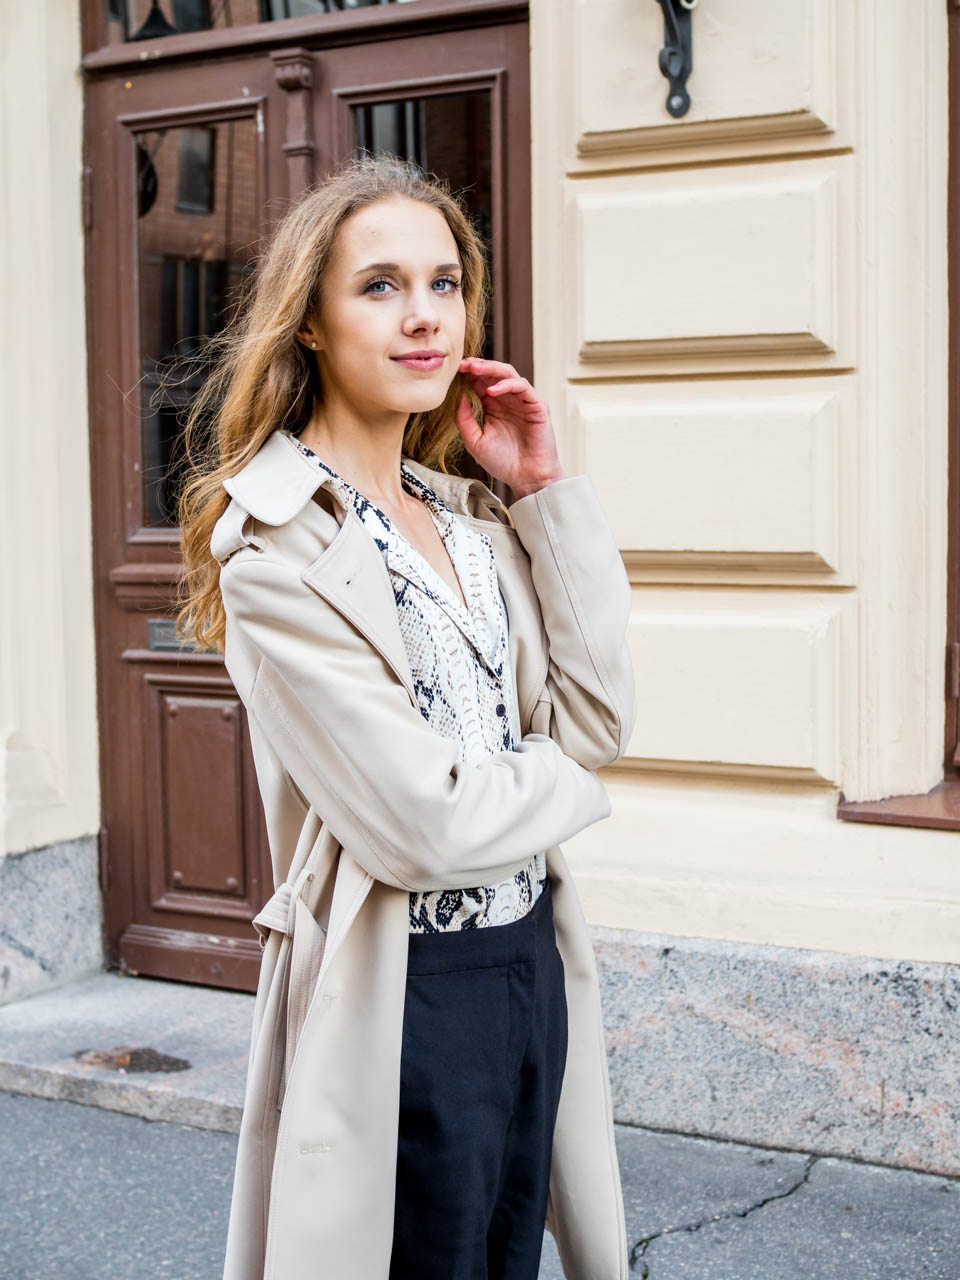 trench-coat-styling-tip-kuinka-pukea-trenssi-modernisti